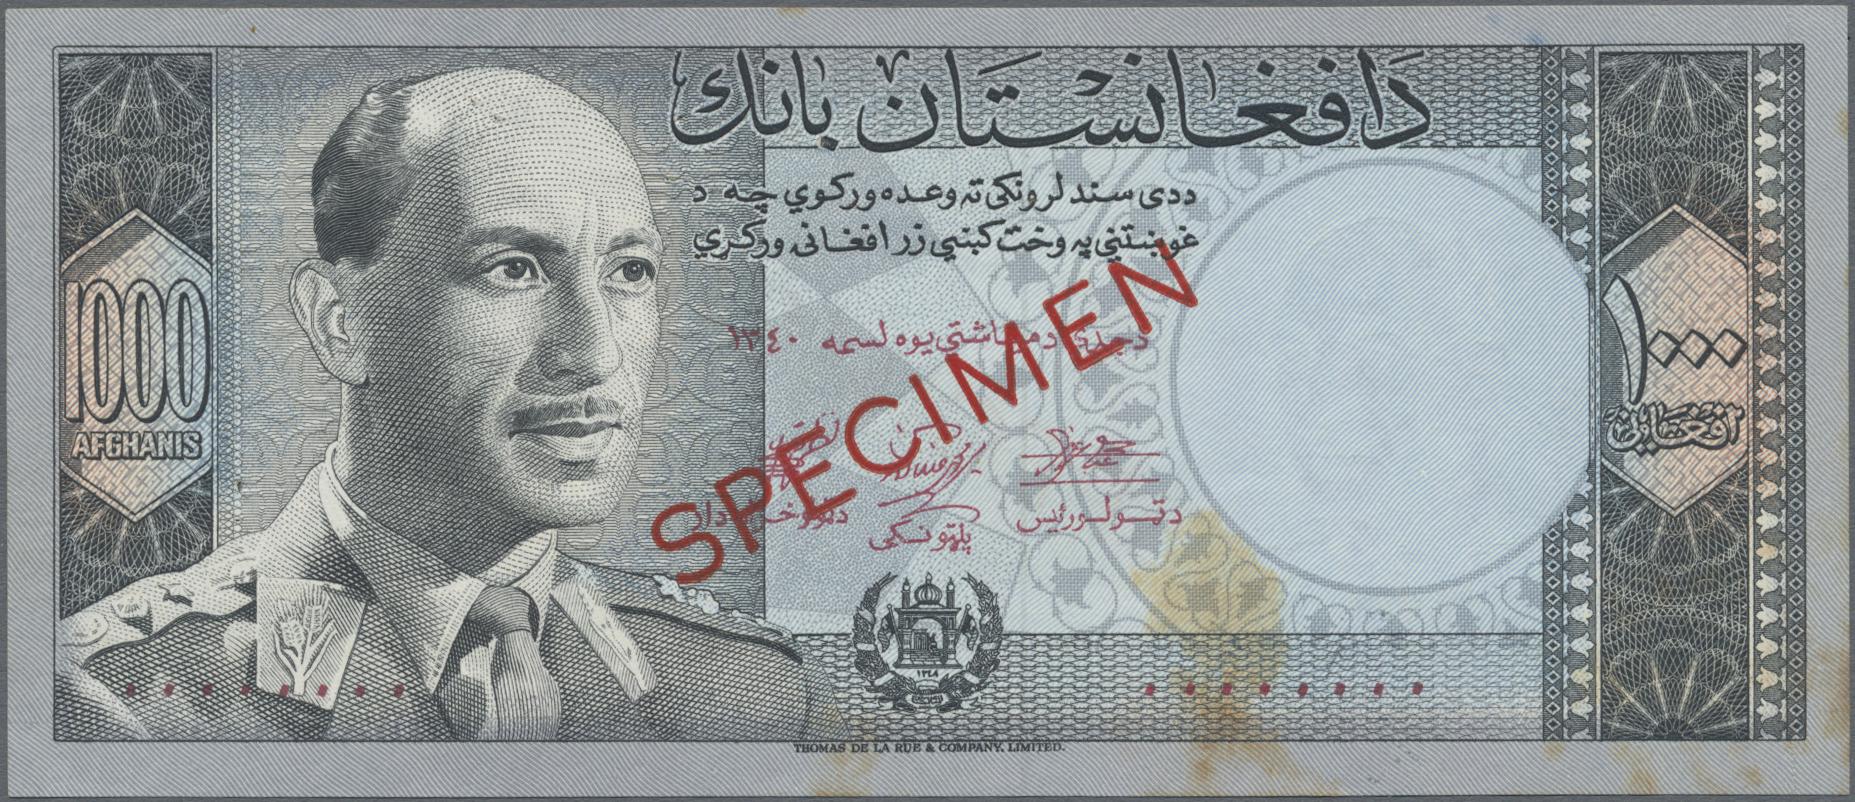 Lot 00008 - Afghanistan | Banknoten  -  Auktionshaus Christoph Gärtner GmbH & Co. KG Sale #48 The Banknotes